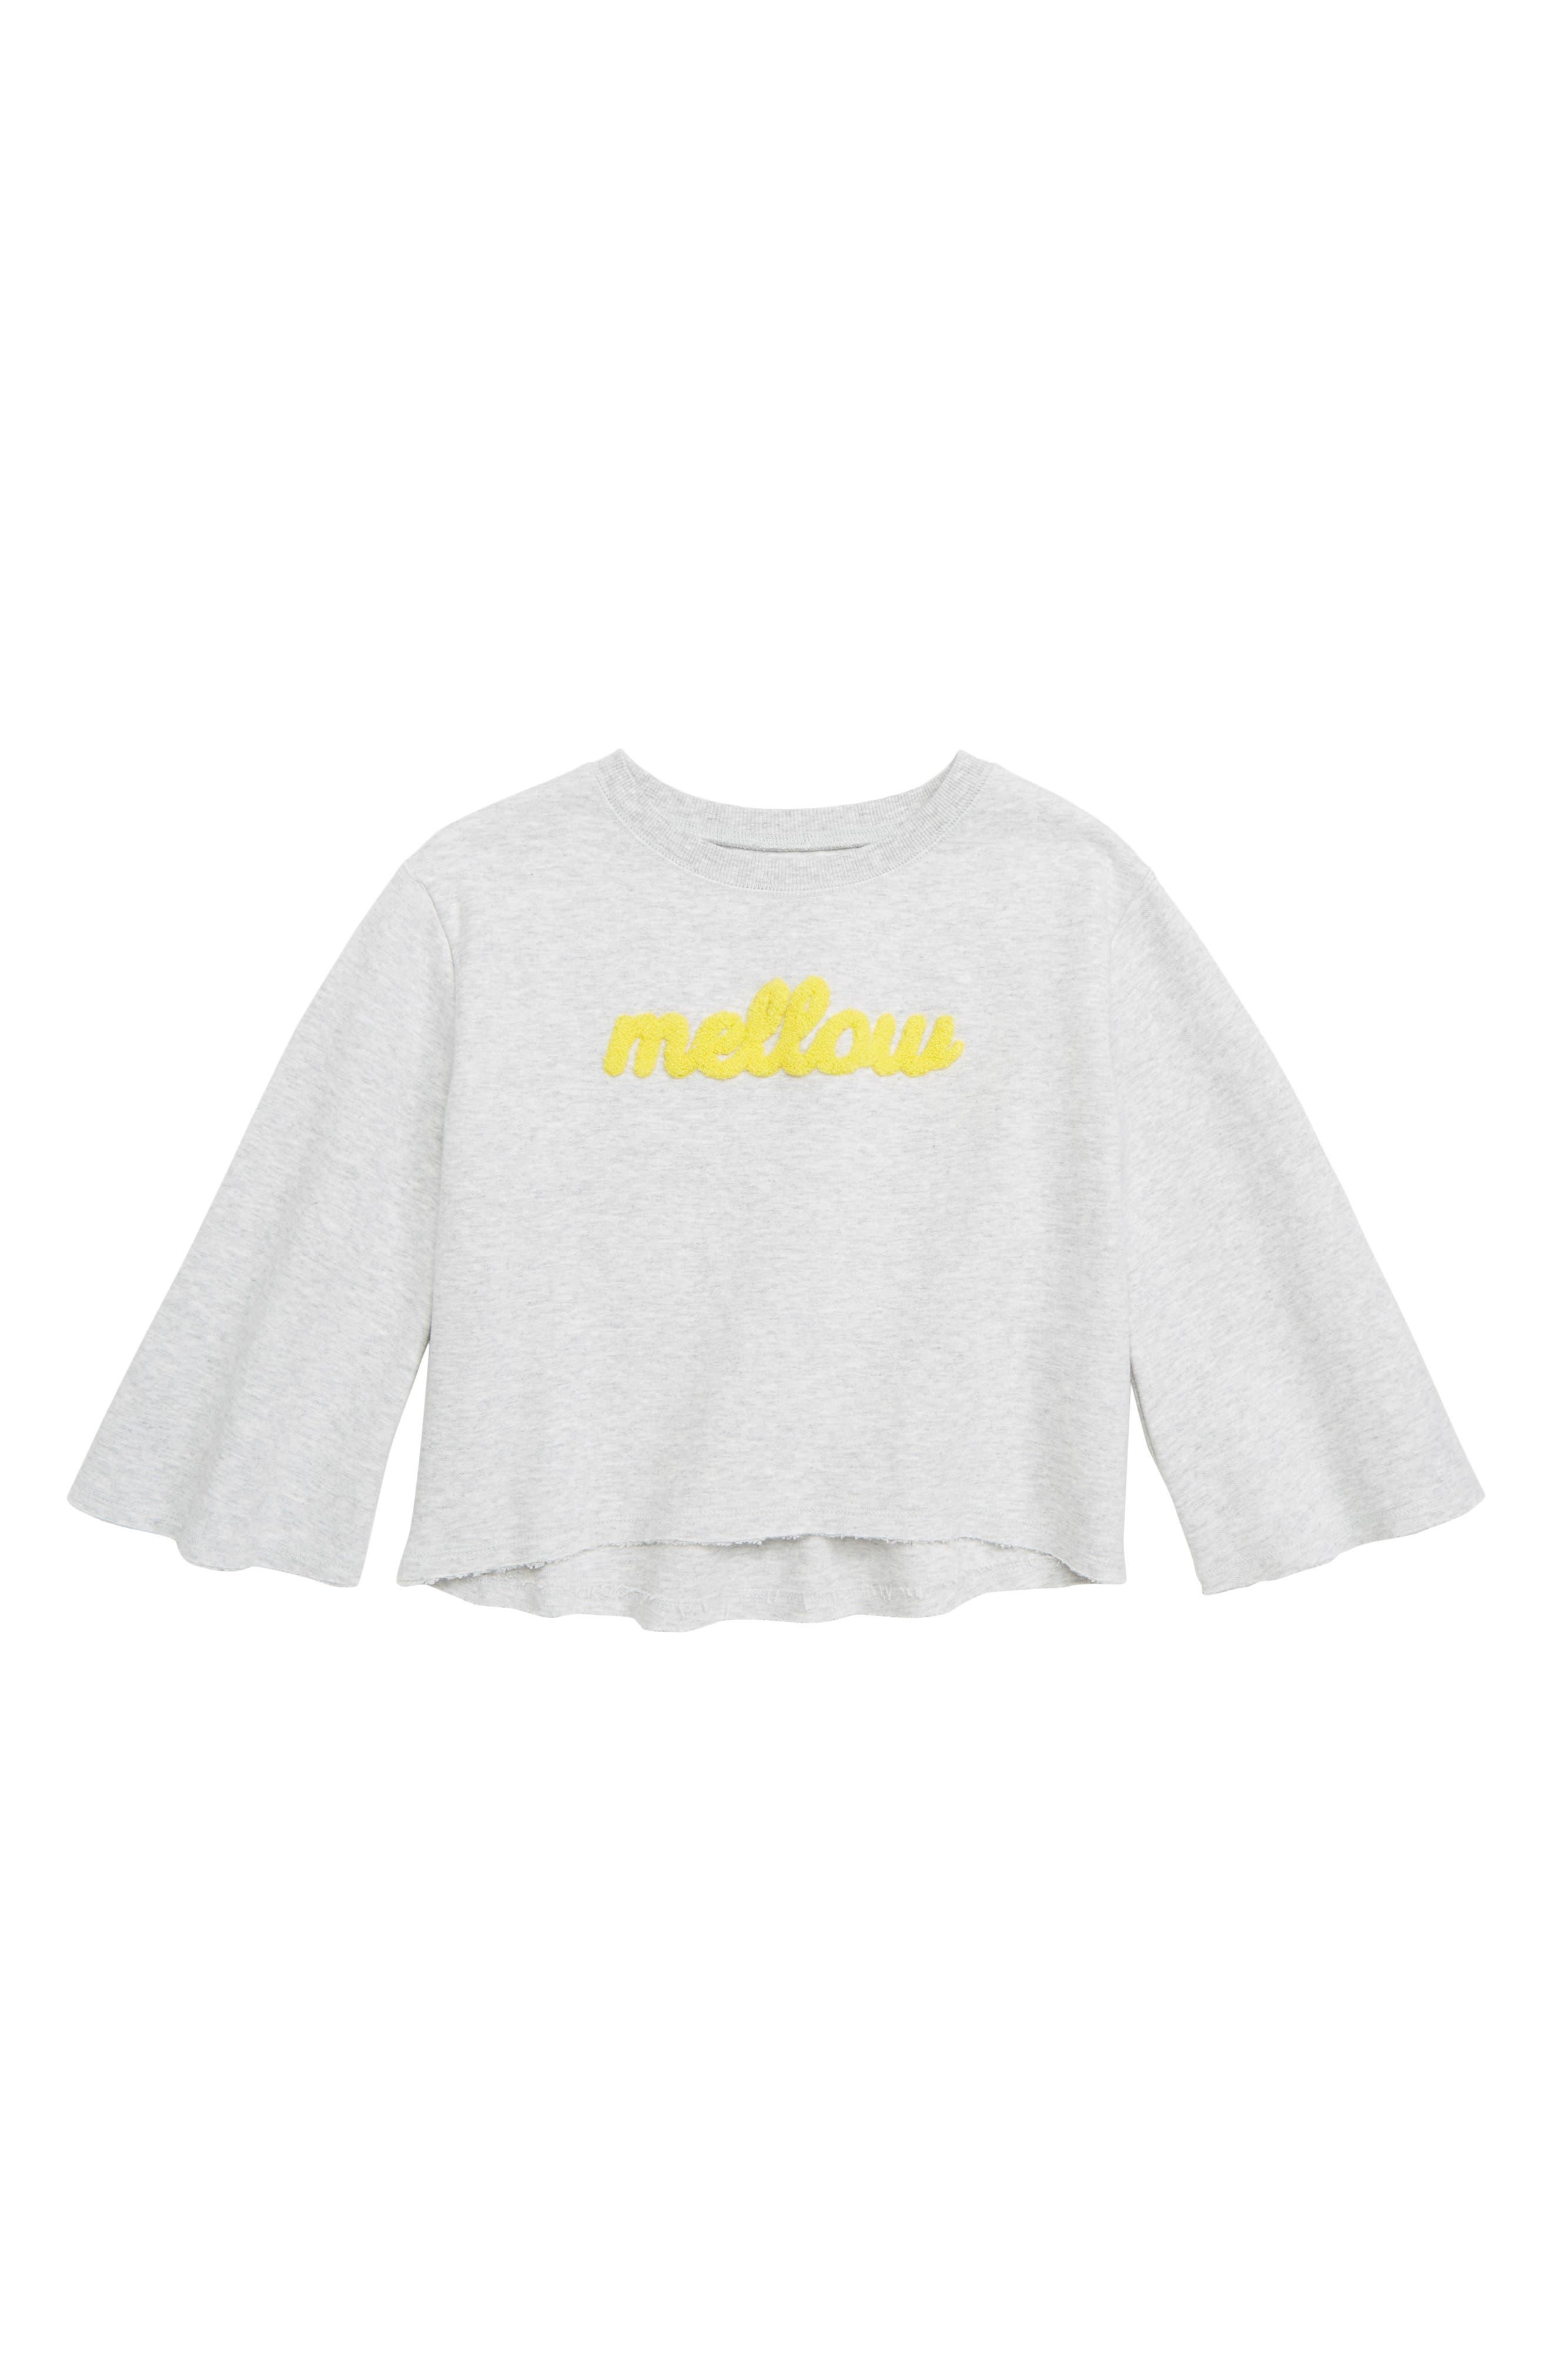 Flare Sleeve Sweatshirt,                             Main thumbnail 1, color,                             GREY ASH HEATHER MELLOW